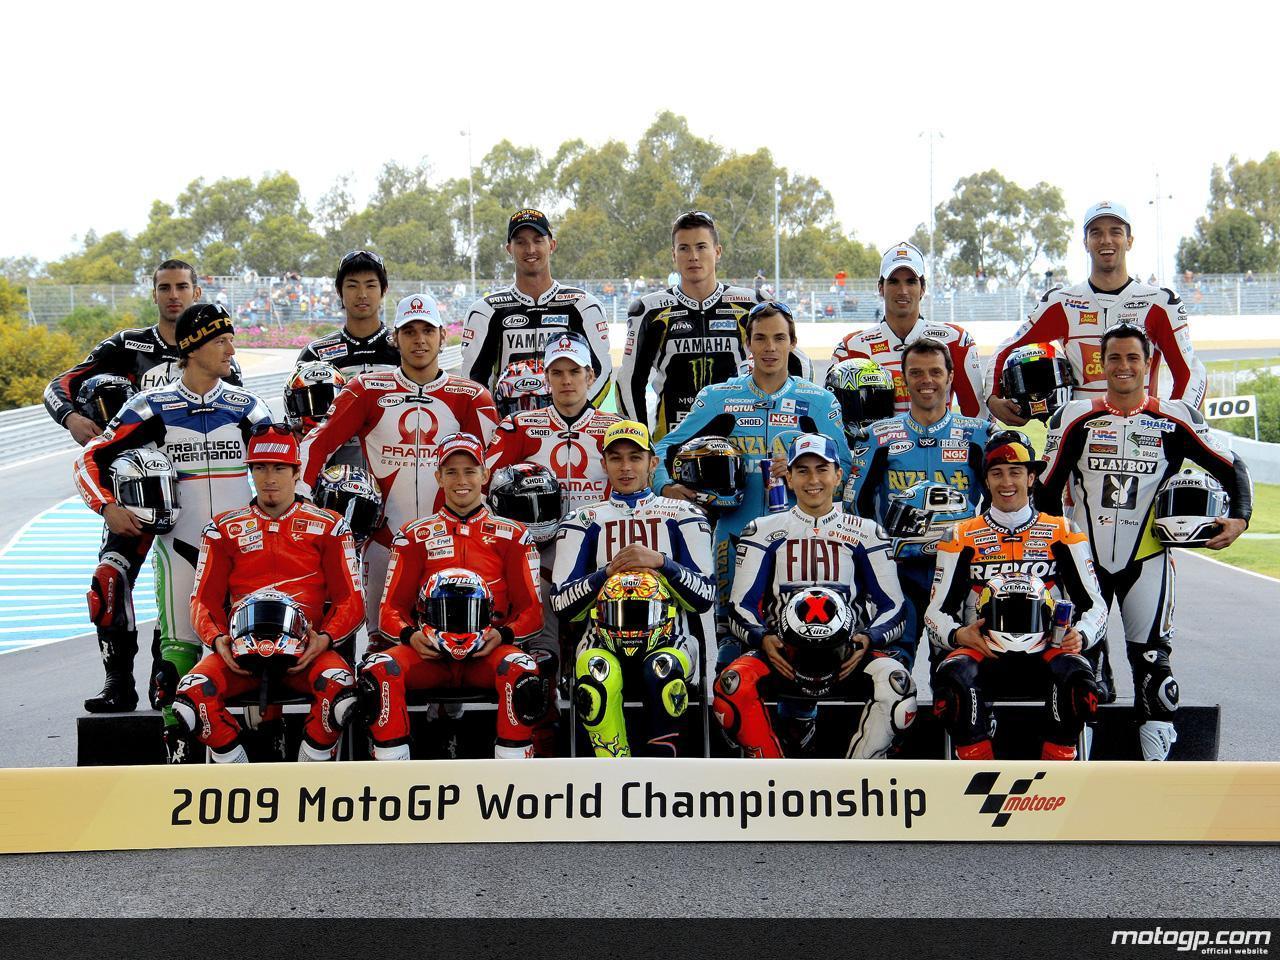 2009 Season - MotoGP World Championship